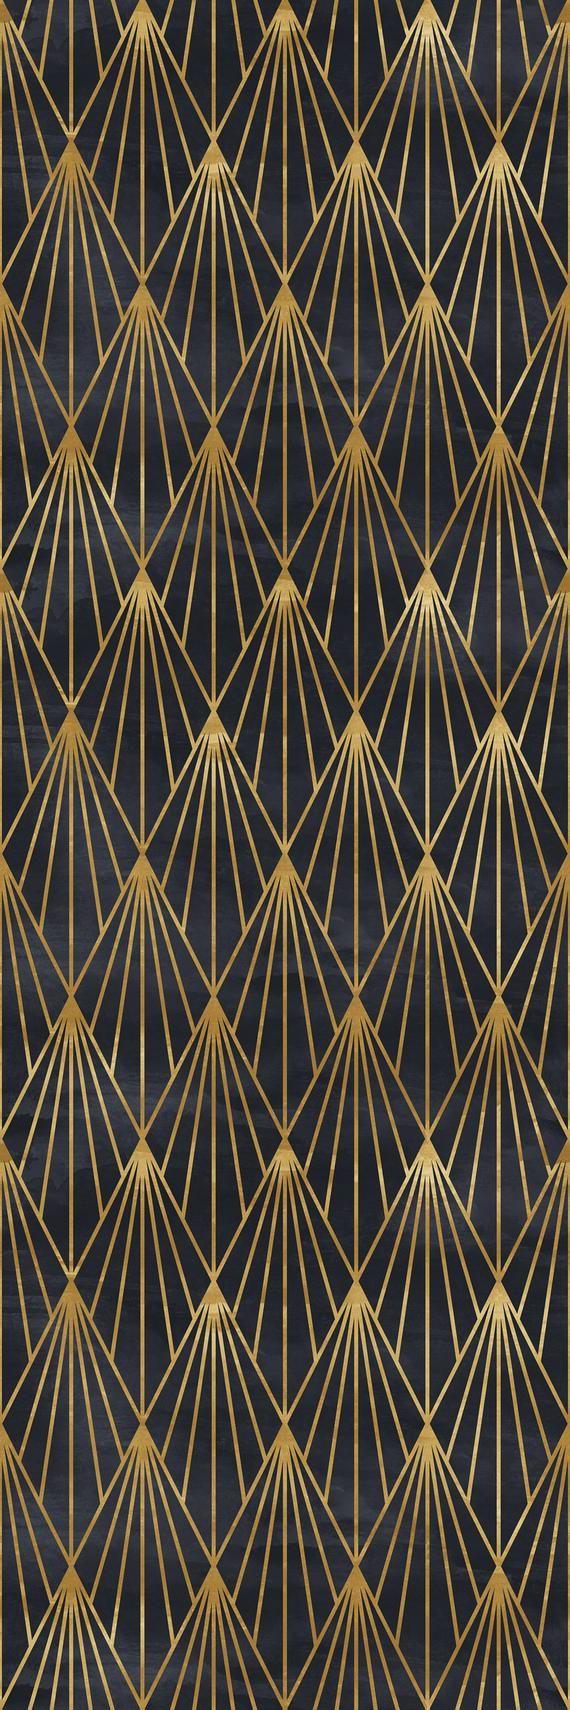 Removable Wallpaper Mural Peel Stick Gatsby Black And Gold Etsy Art Deco Wallpaper Art Deco Pattern Mural Wallpaper